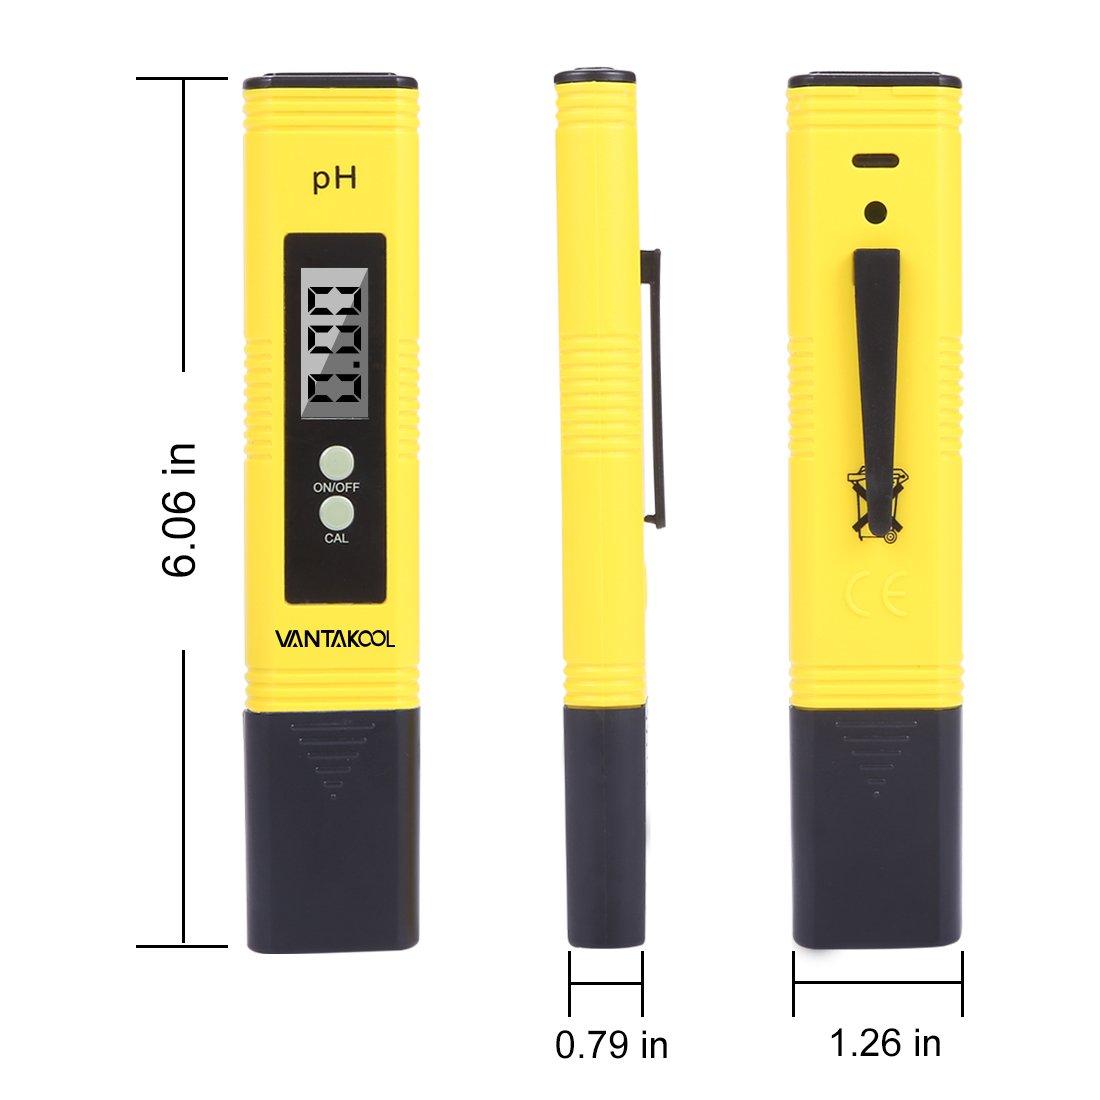 VANTAKOOL Digital PH Meter, 0.01 PH High Accuracy Water Quality Tester with 0-14 PH Measurement Range for Household Drinking, Pool and Aquarium Water PH Tester Design with ATC (yellow) by VantaKool (Image #2)